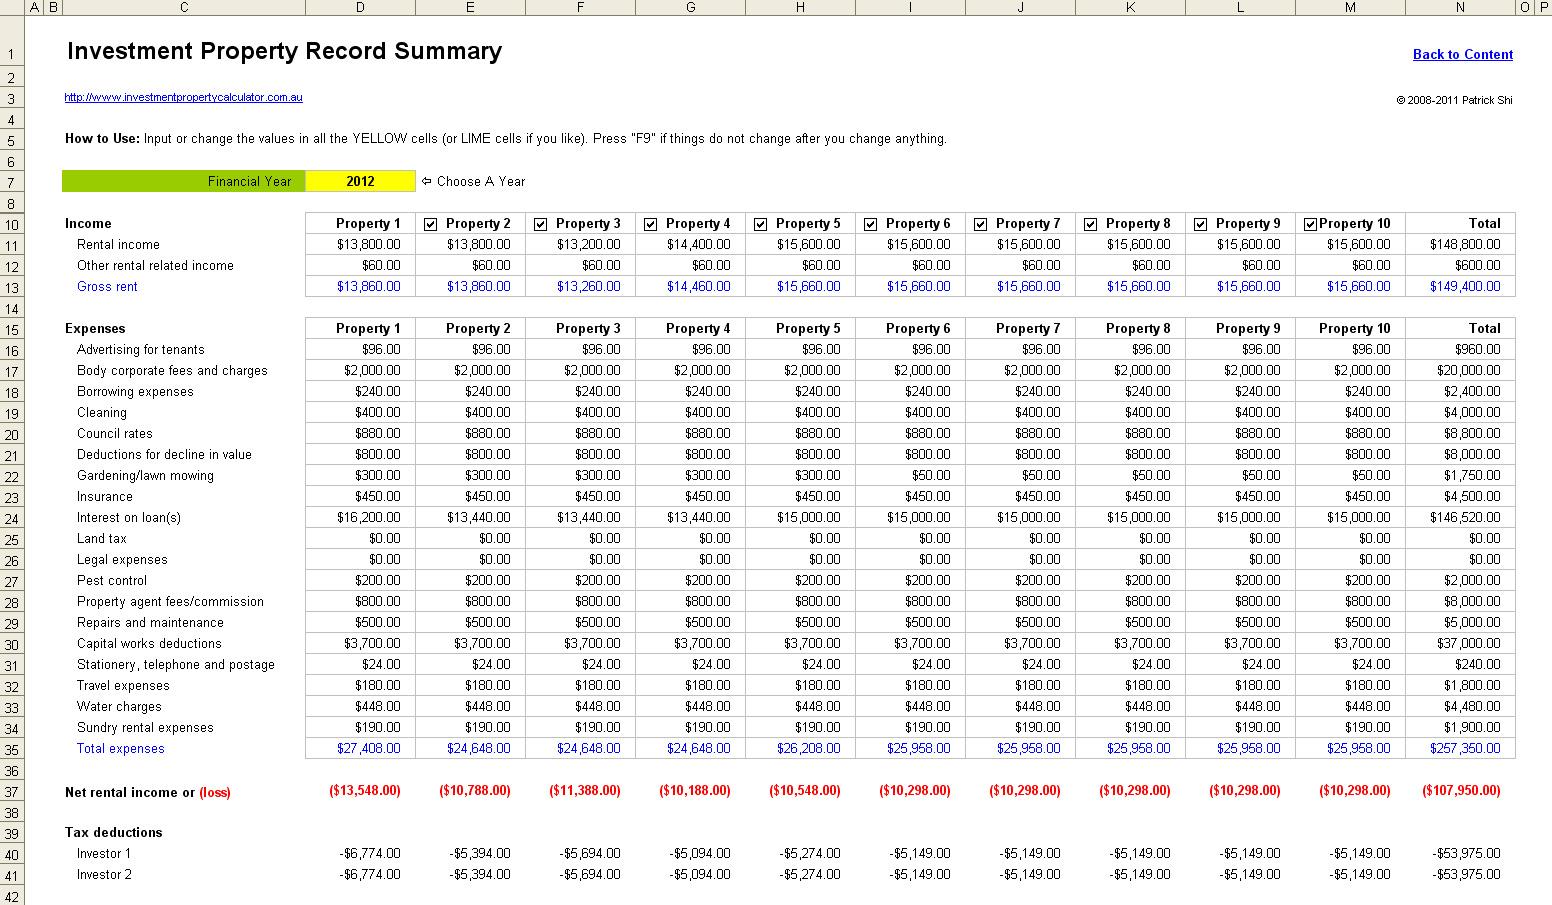 Rental Cash Flow Spreadsheet Spreadsheet Downloa Rental Cash Flow Spreadsheet Rental Cash Flow